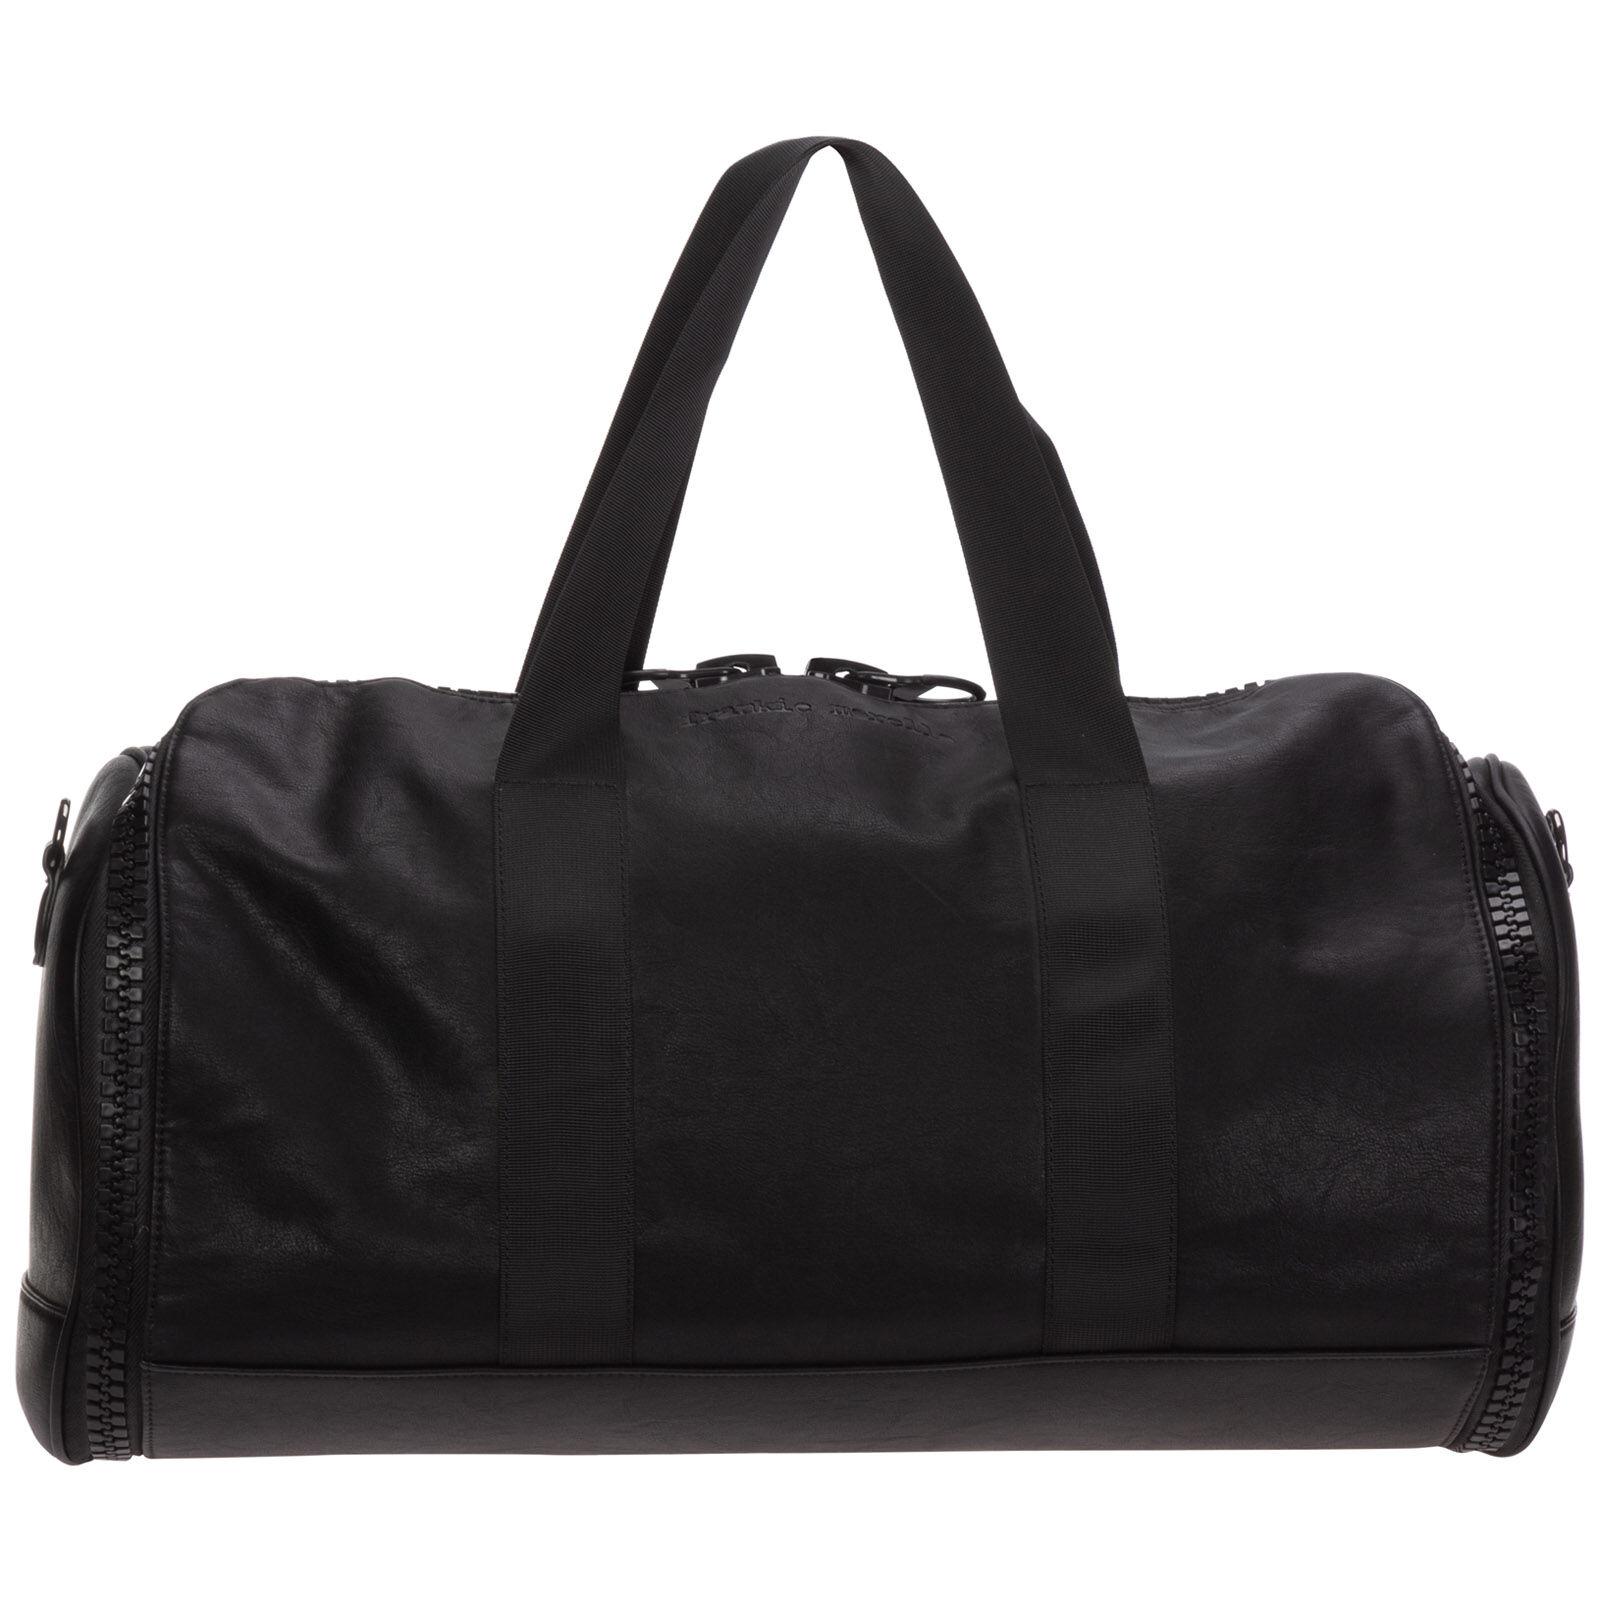 Frankie Morello Men's fitness gym sports bag  - Black